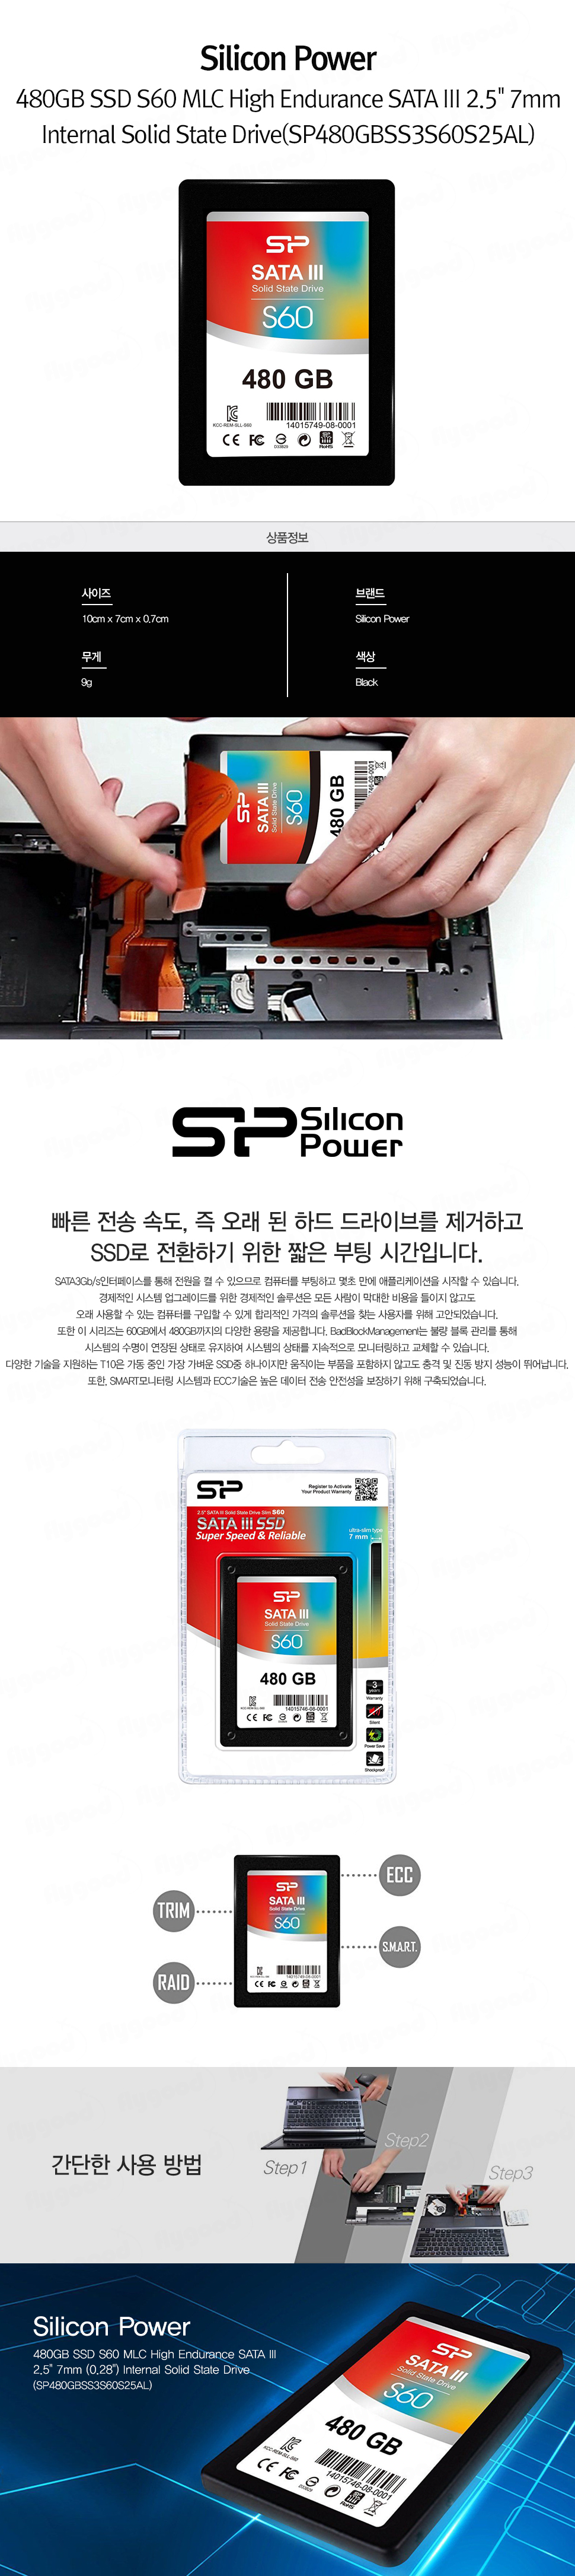 Silicon_Power_480GB_SSD_S60_MLC_High_Endurance_SATAIII_2.jpg